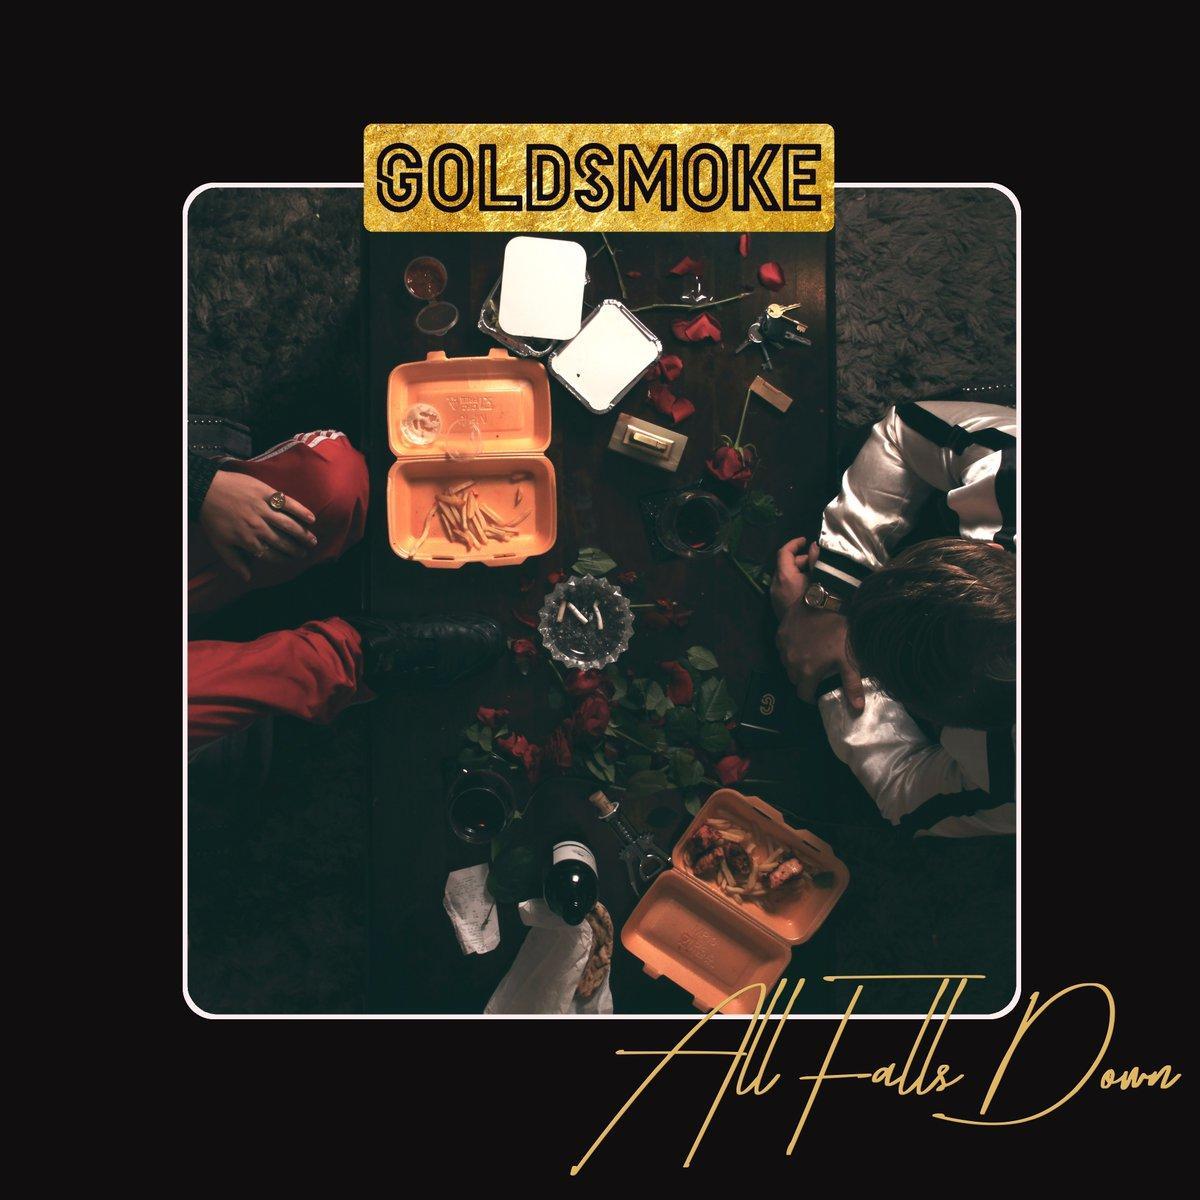 Goldsmoke - Late Interventions